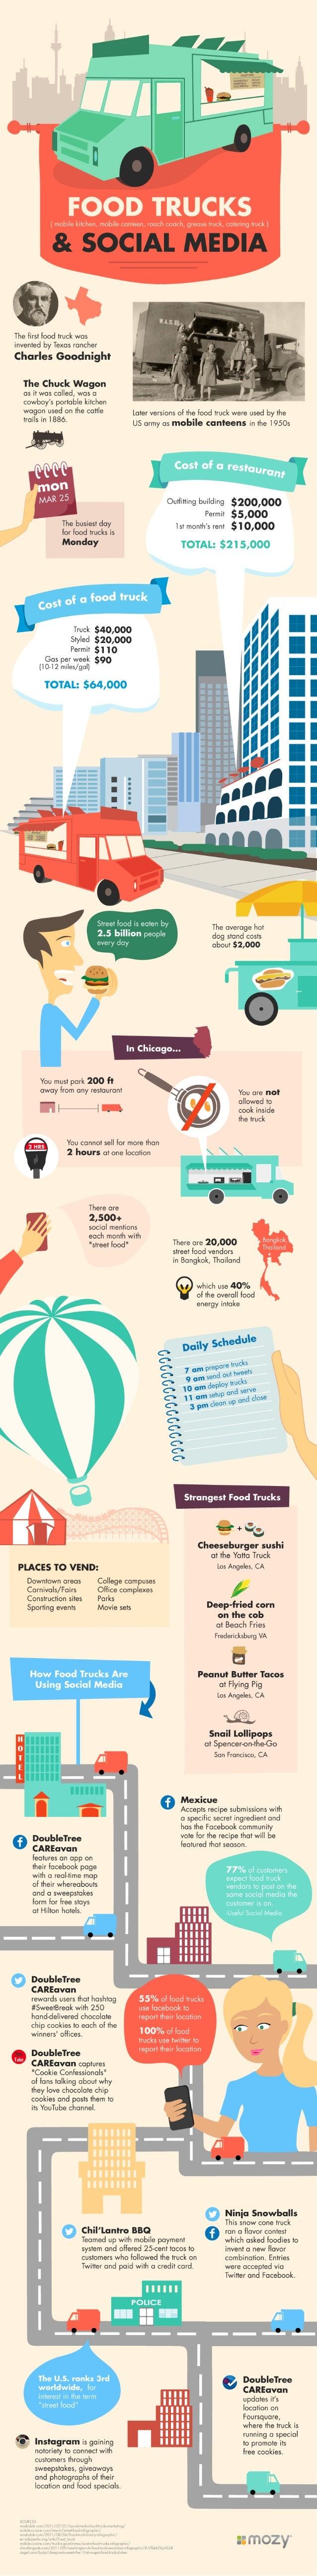 Food Trucks and Social Media